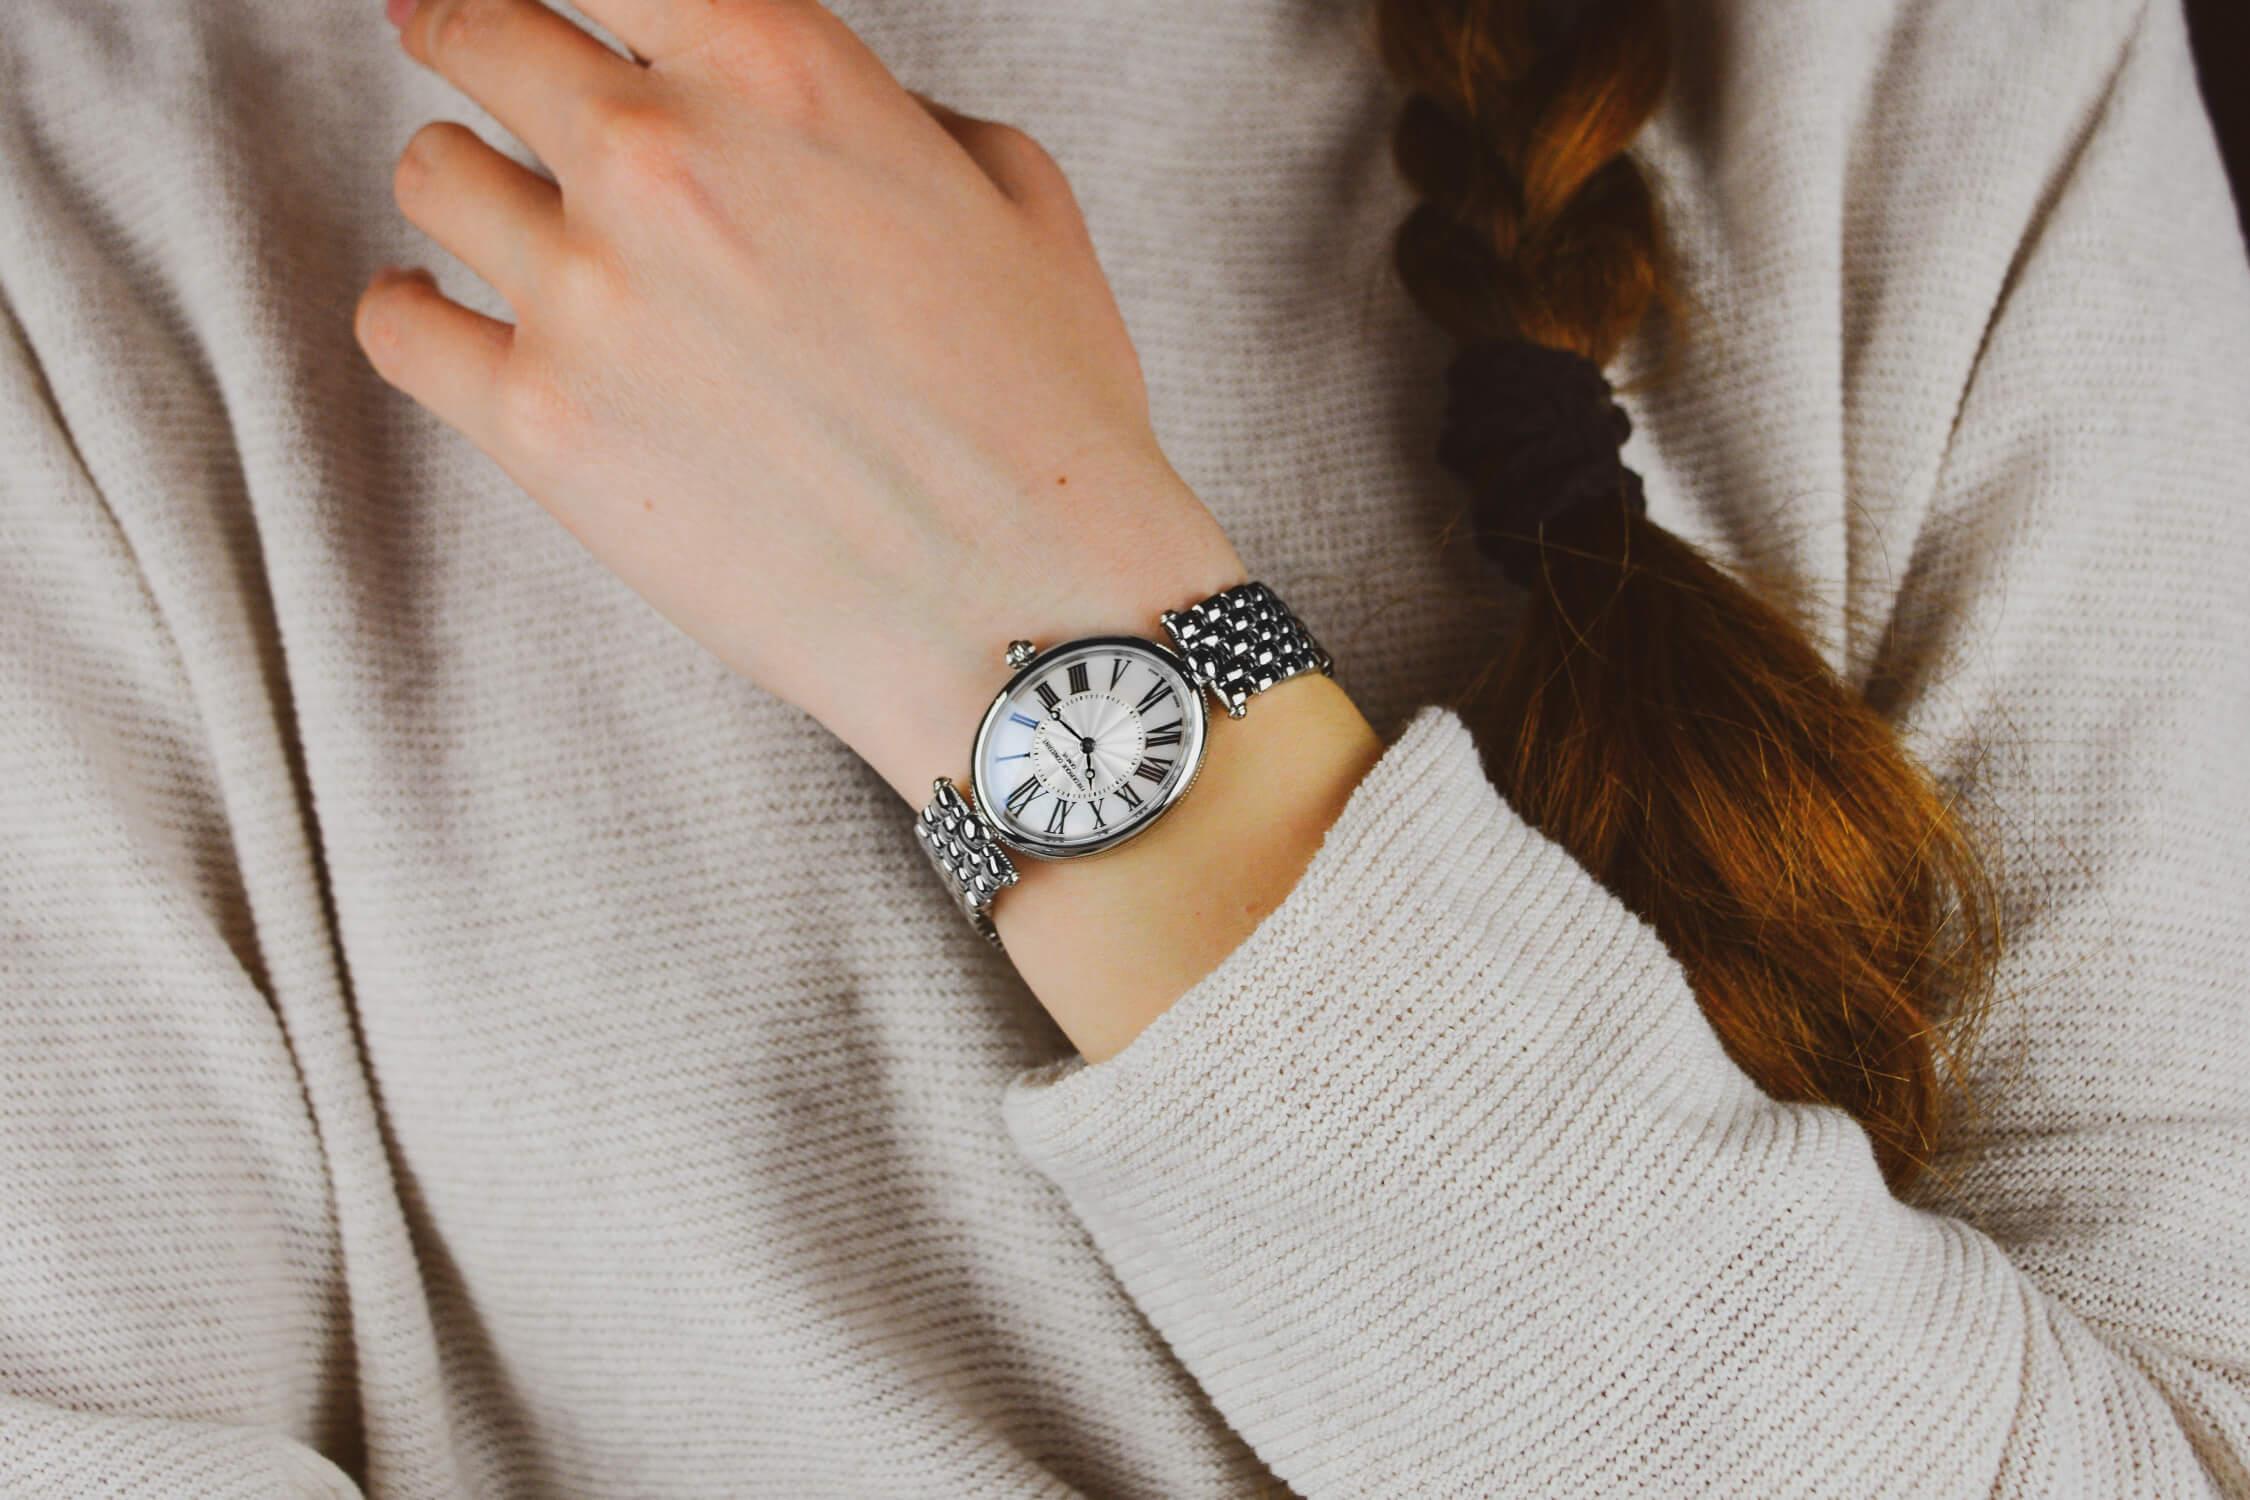 женские часы фредерик констант